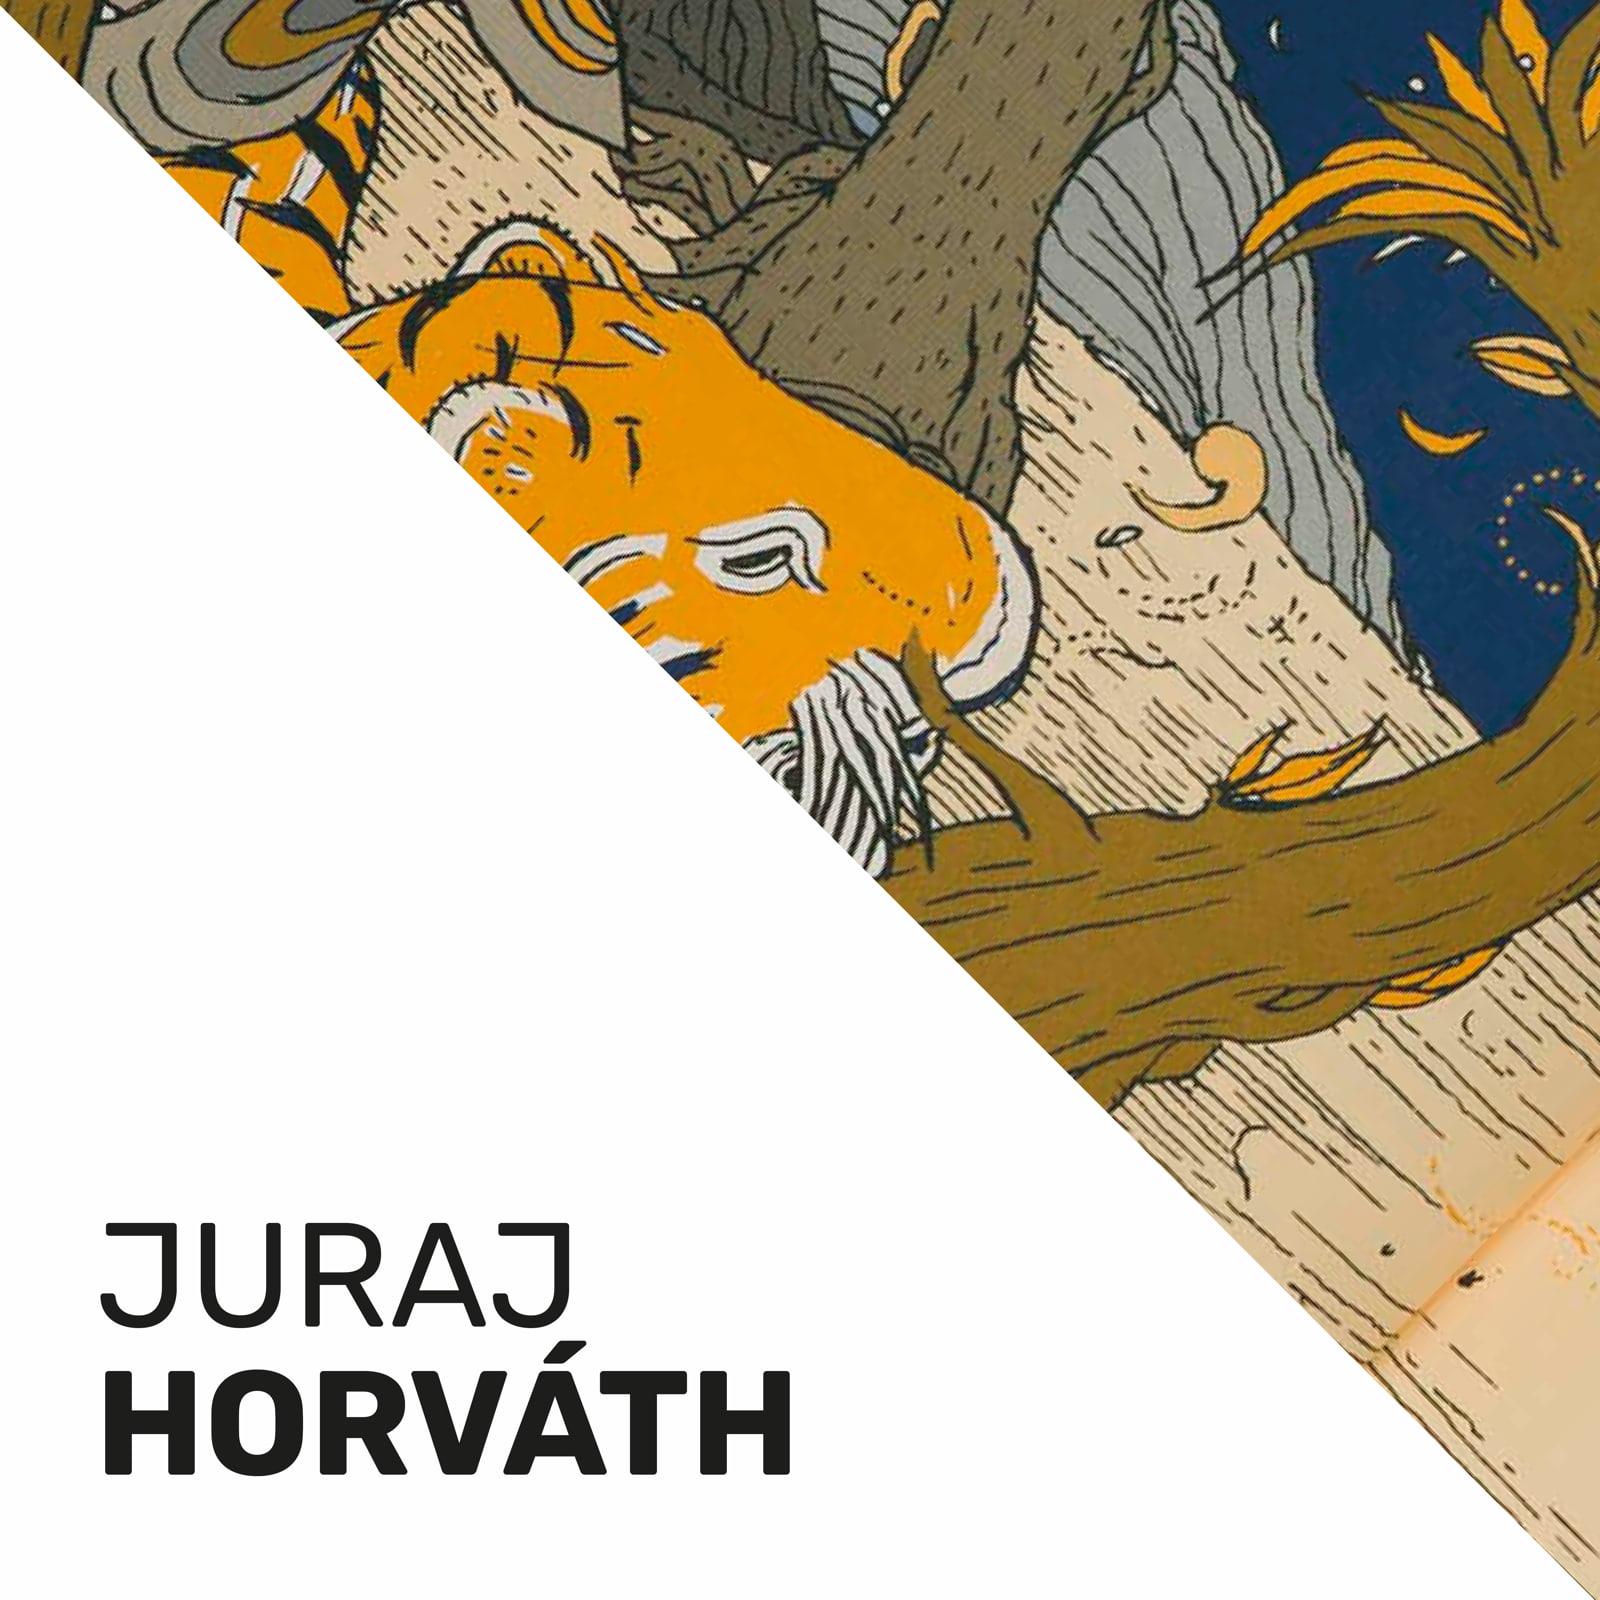 Juraj horvath 1